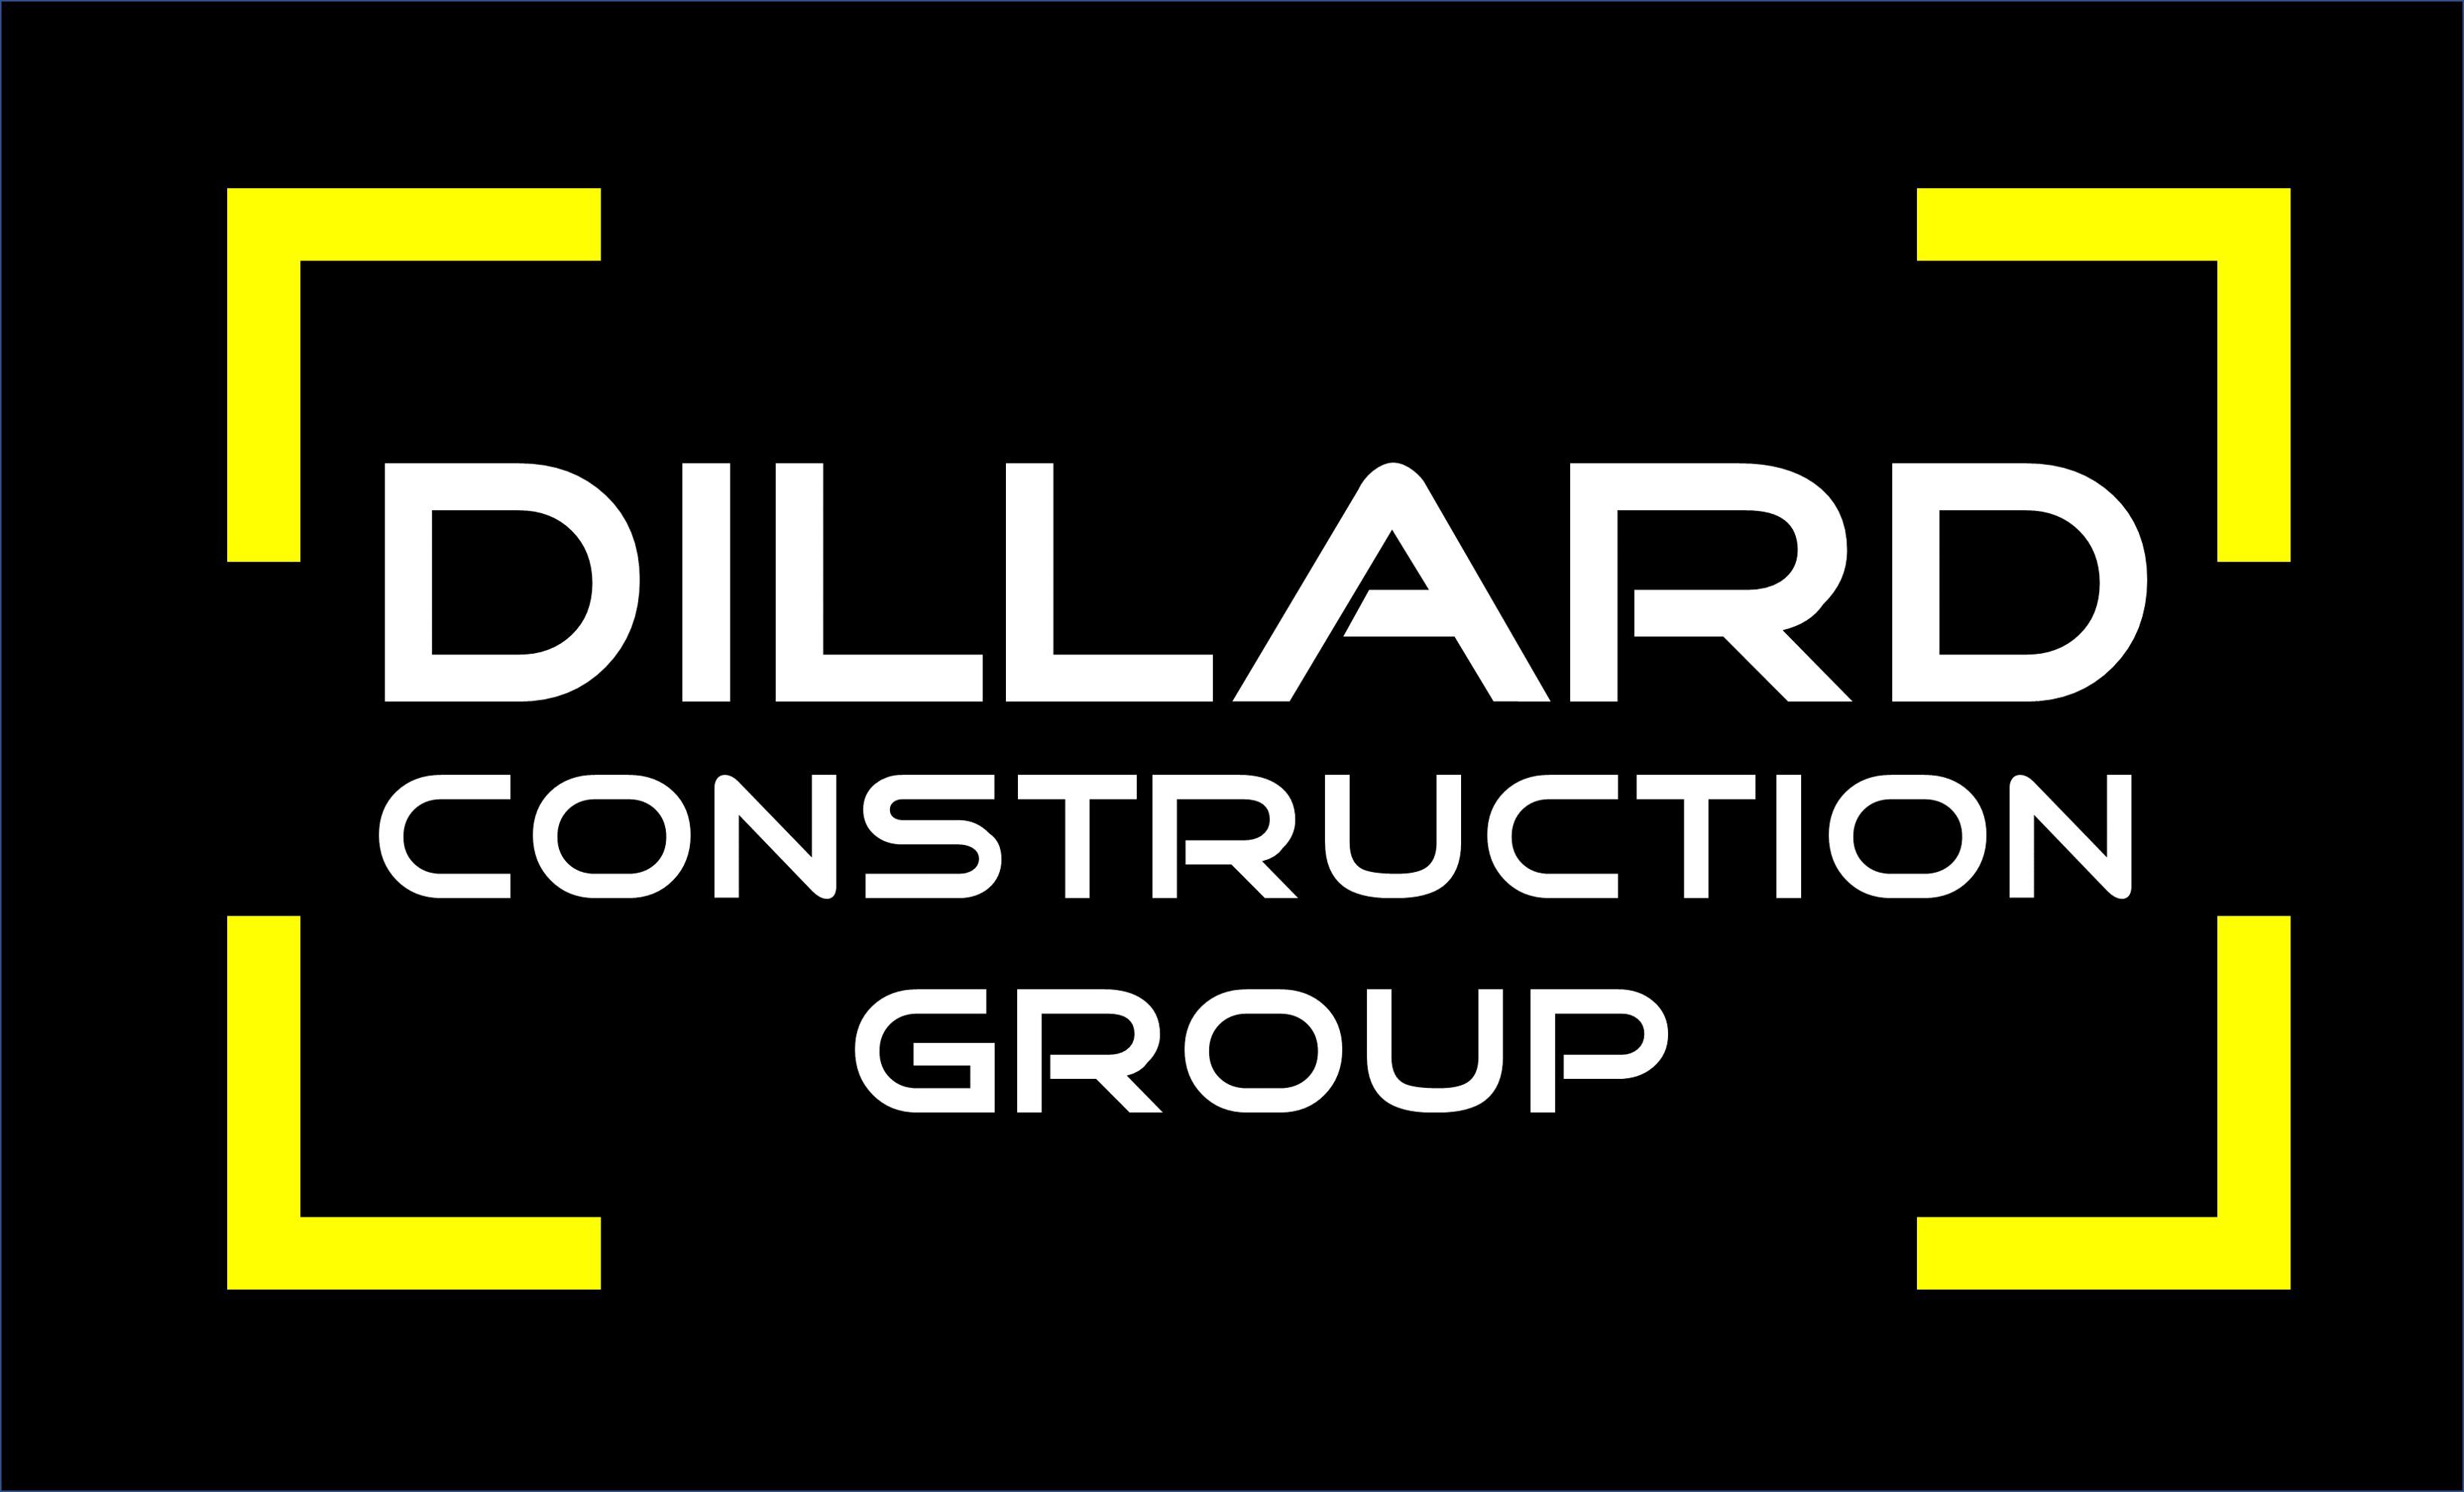 Dillard Construction Group LLC logo